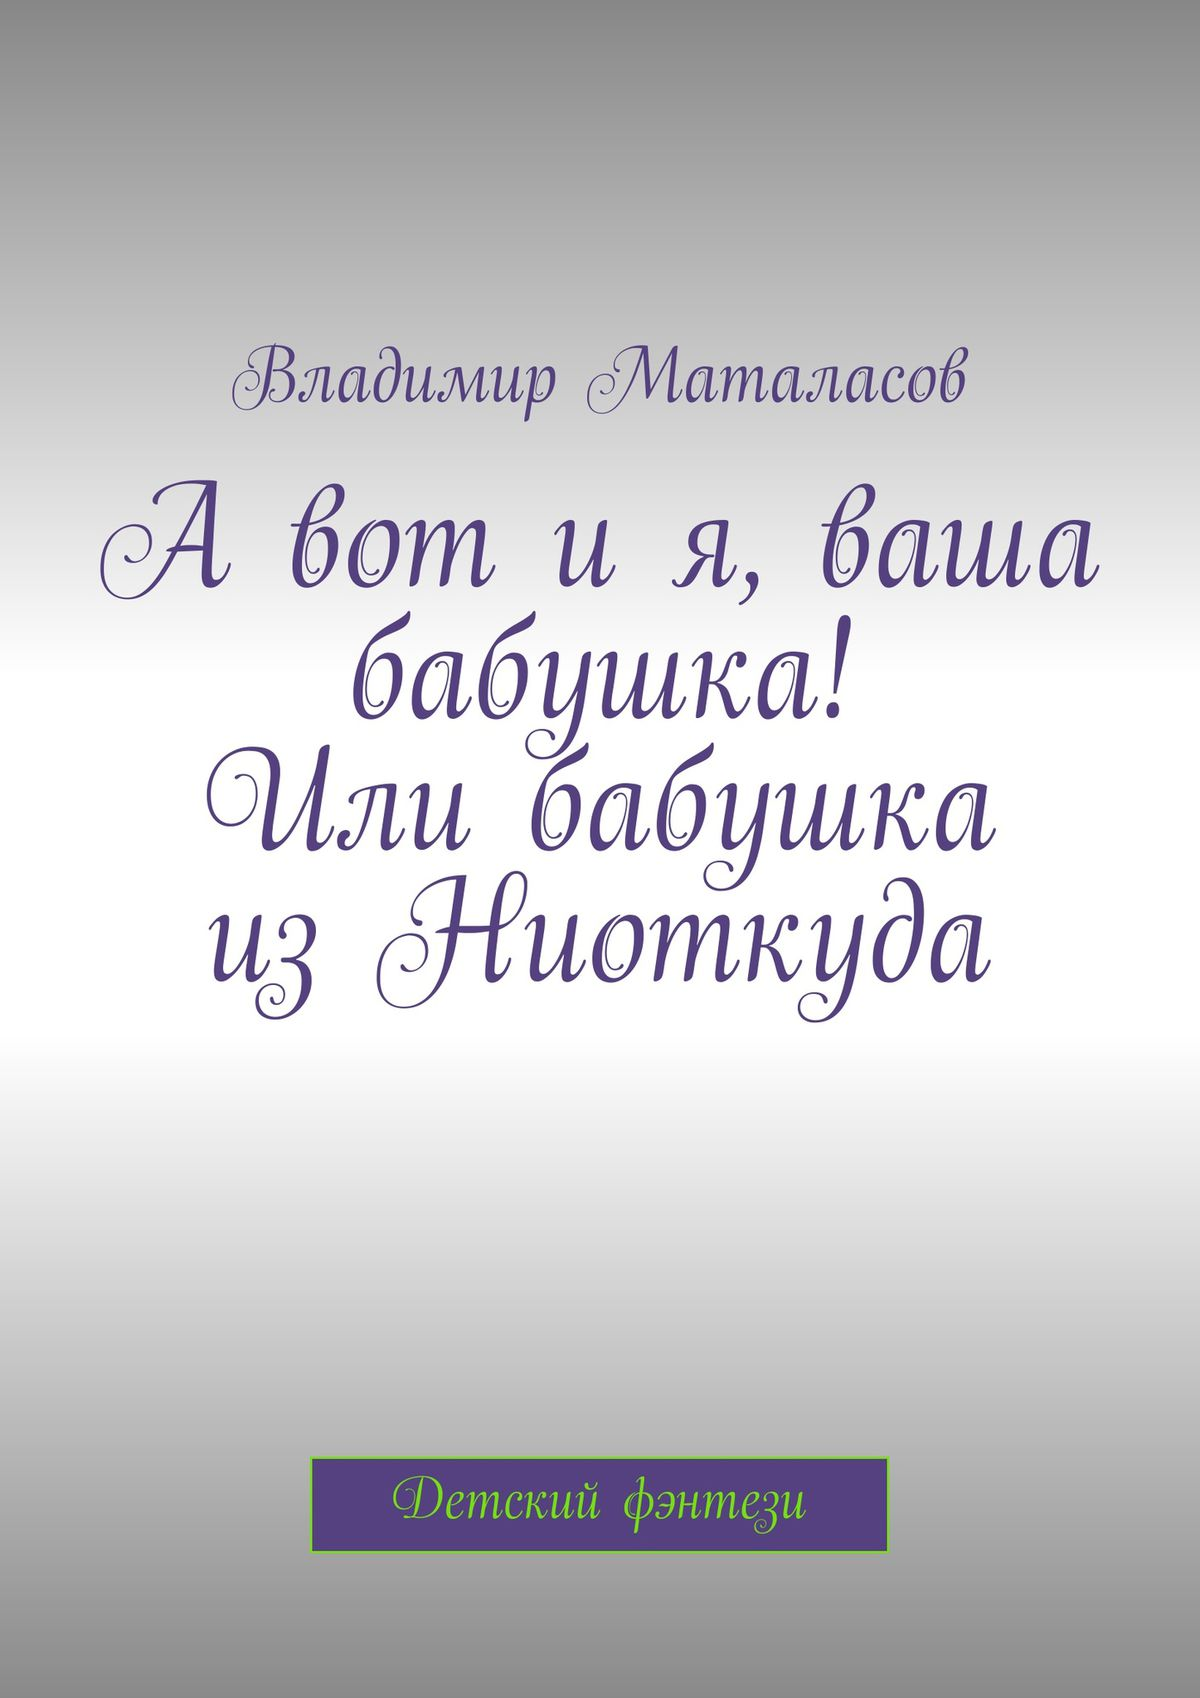 Владимир Маталасов Авот ия, ваша бабушка! Или Бабушка изНиоткуда варди дж из ниоткуда автобиография isbn 9785699958054